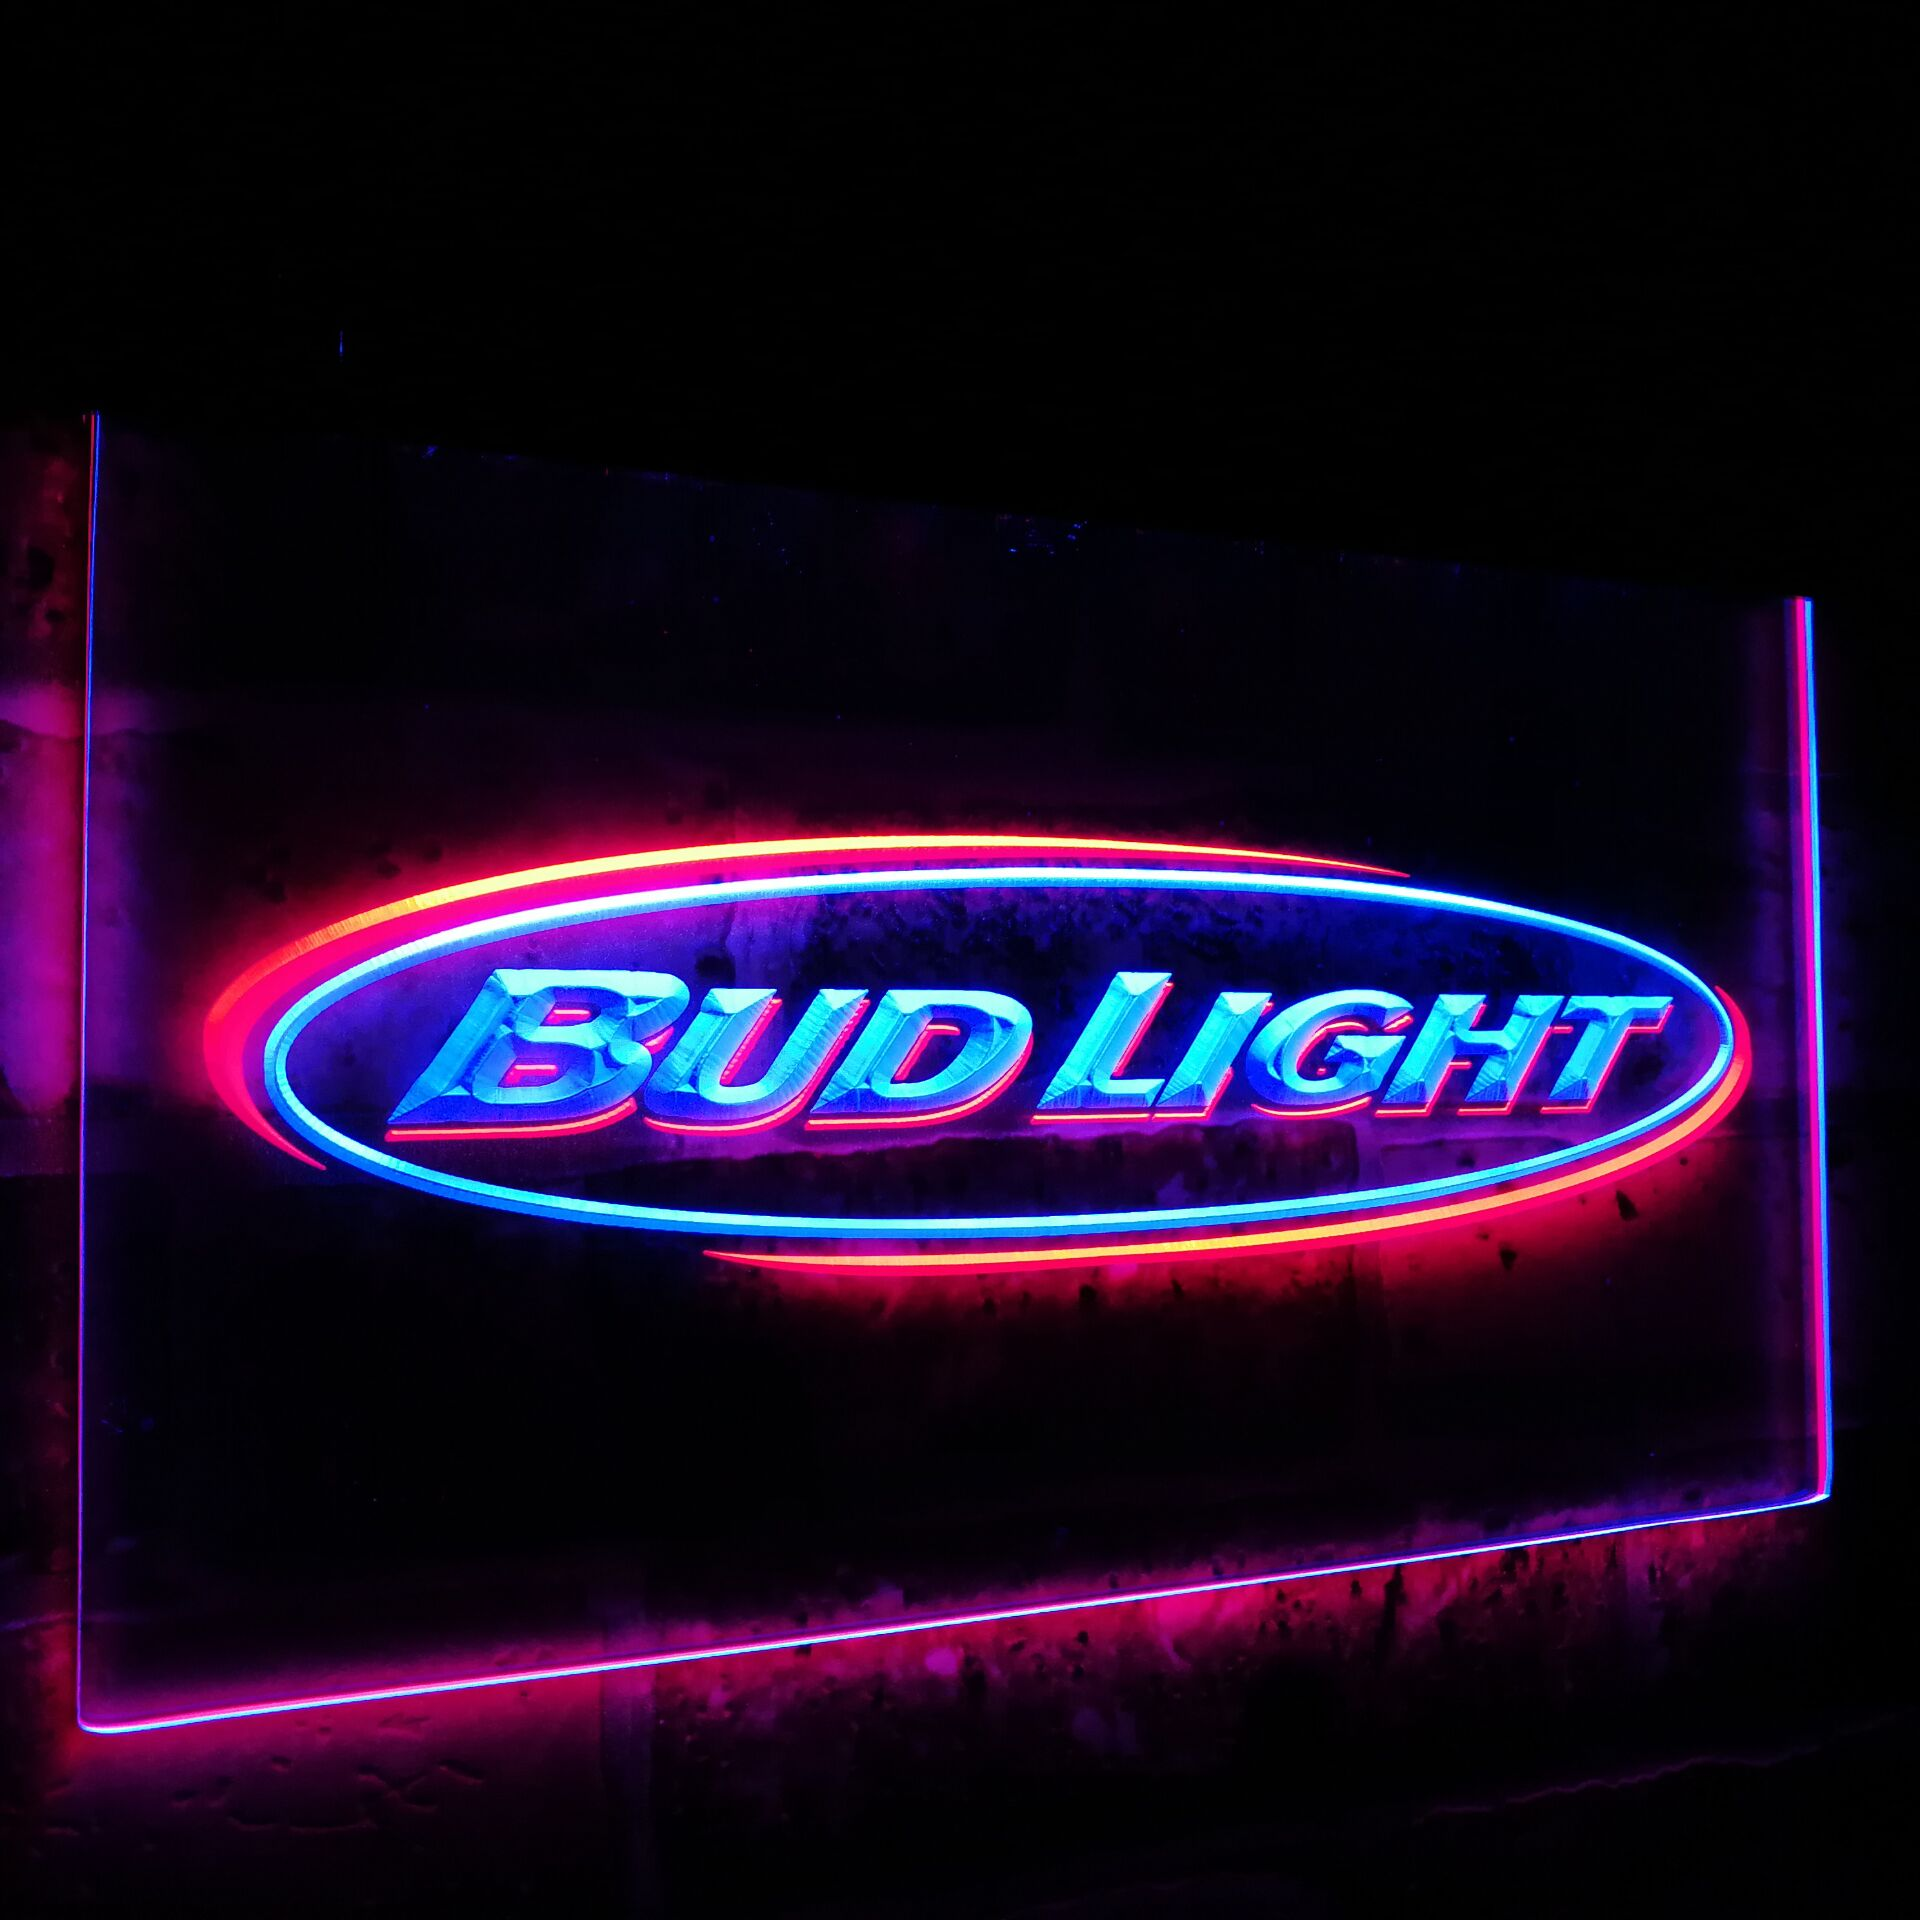 Bud Light Beer Bar Decoration Gift Dual Color Led Neon Light Signs st6-0001Bud Light Beer Bar Decoration Gift Dual Color Led Neon Light Signs st6-0001